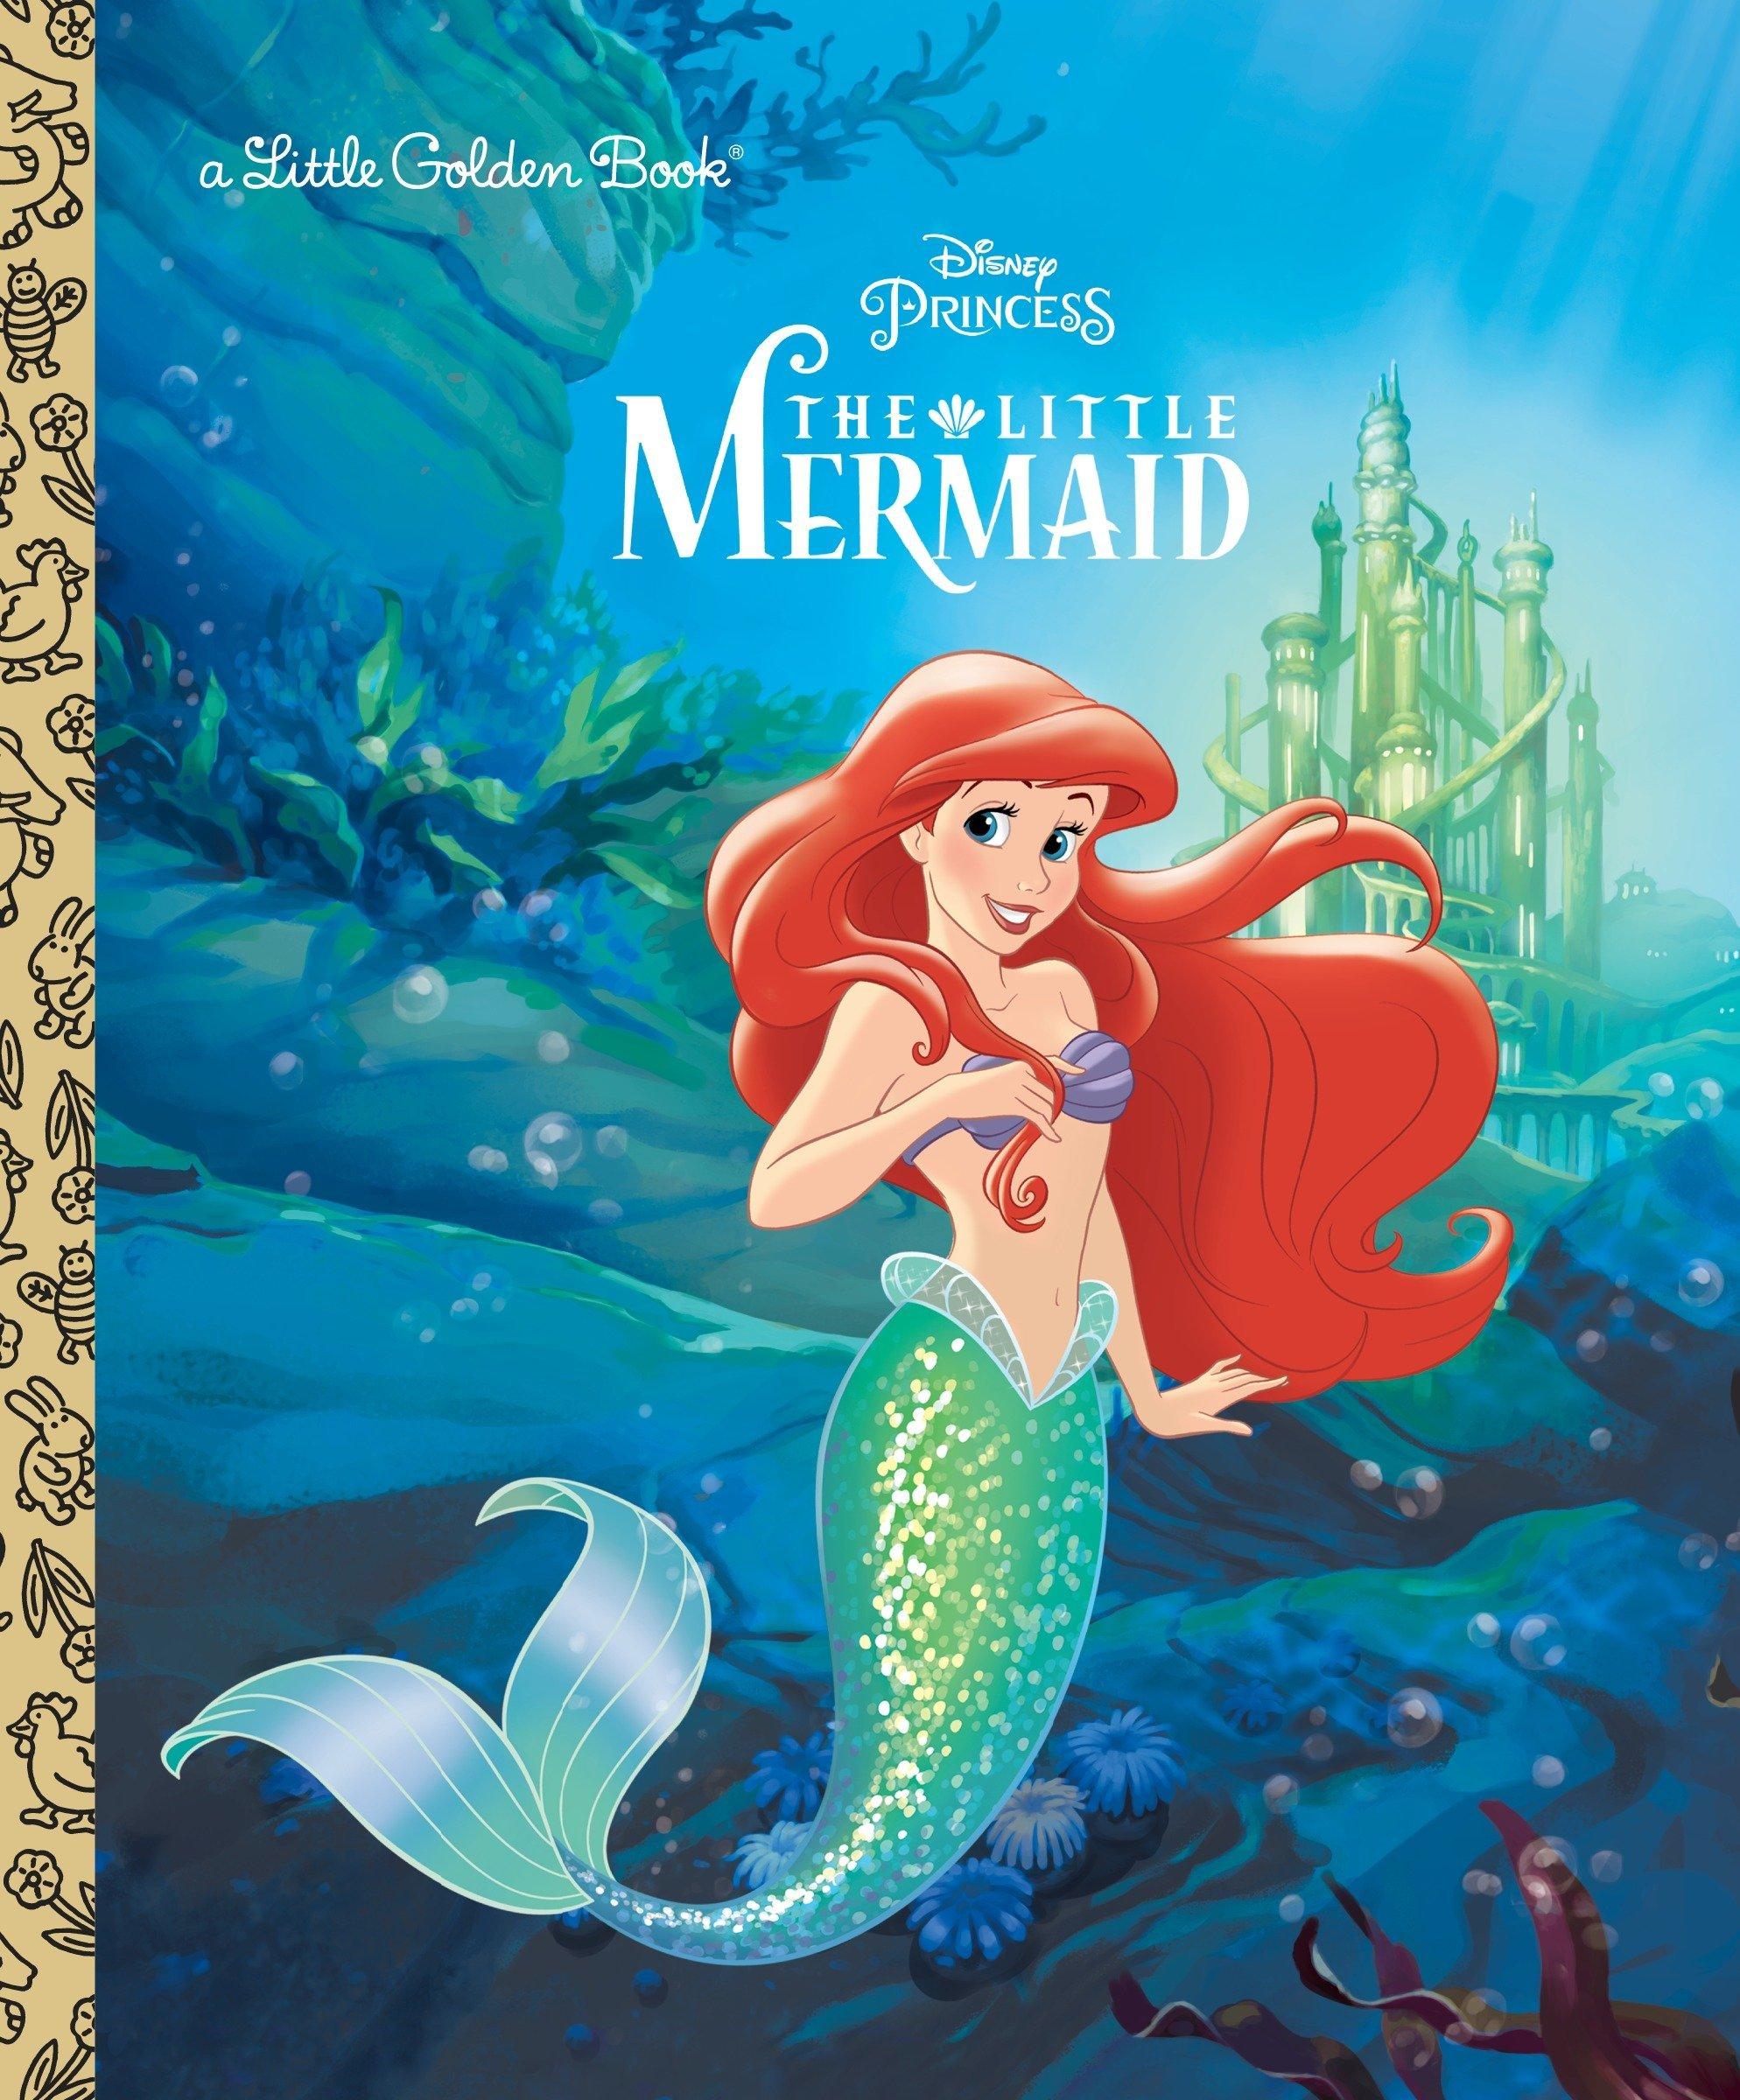 The little disney princess. Mermaid